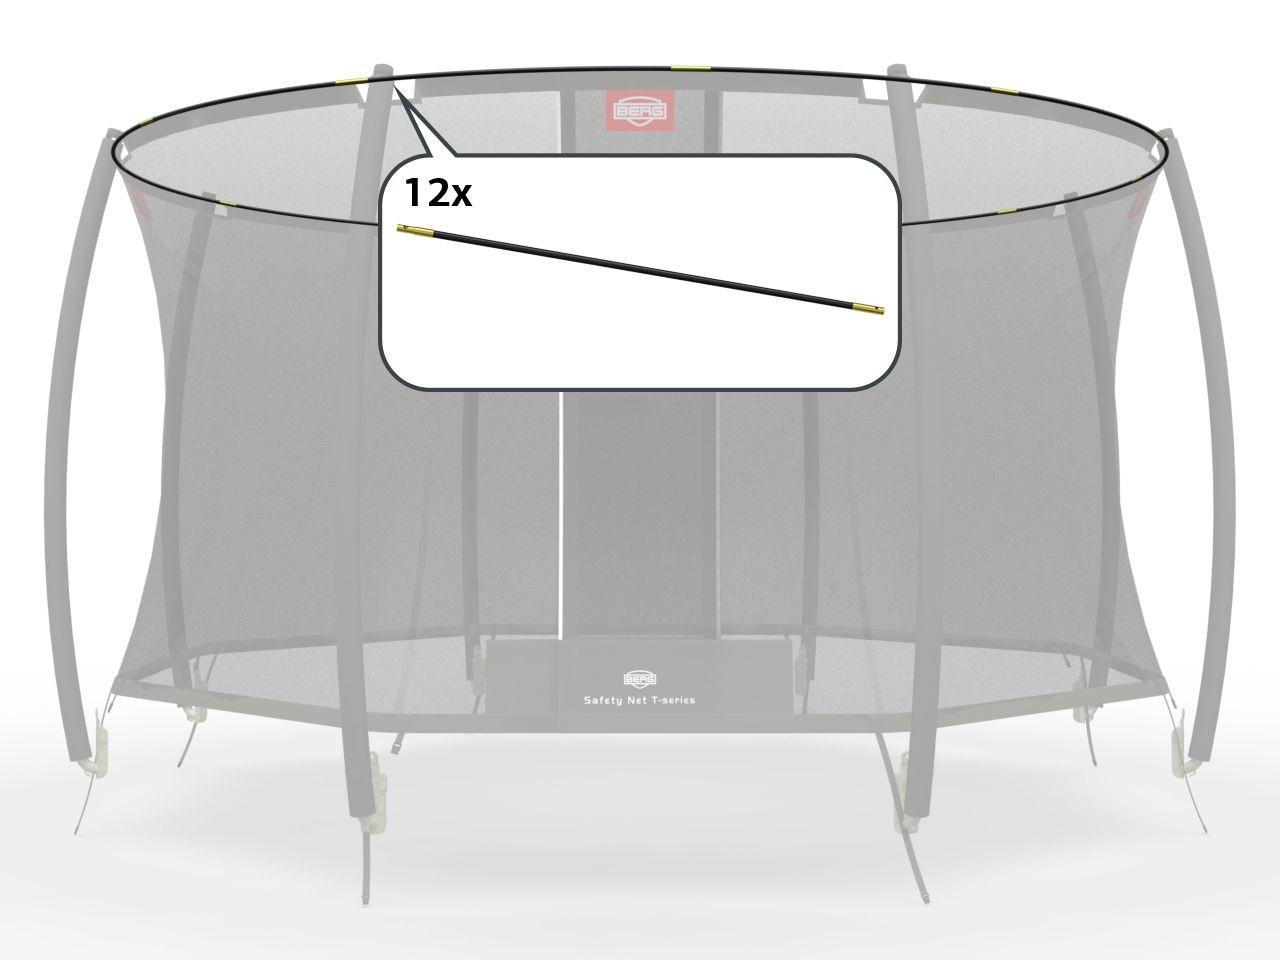 Safety Net T-series - Hoepelset 430